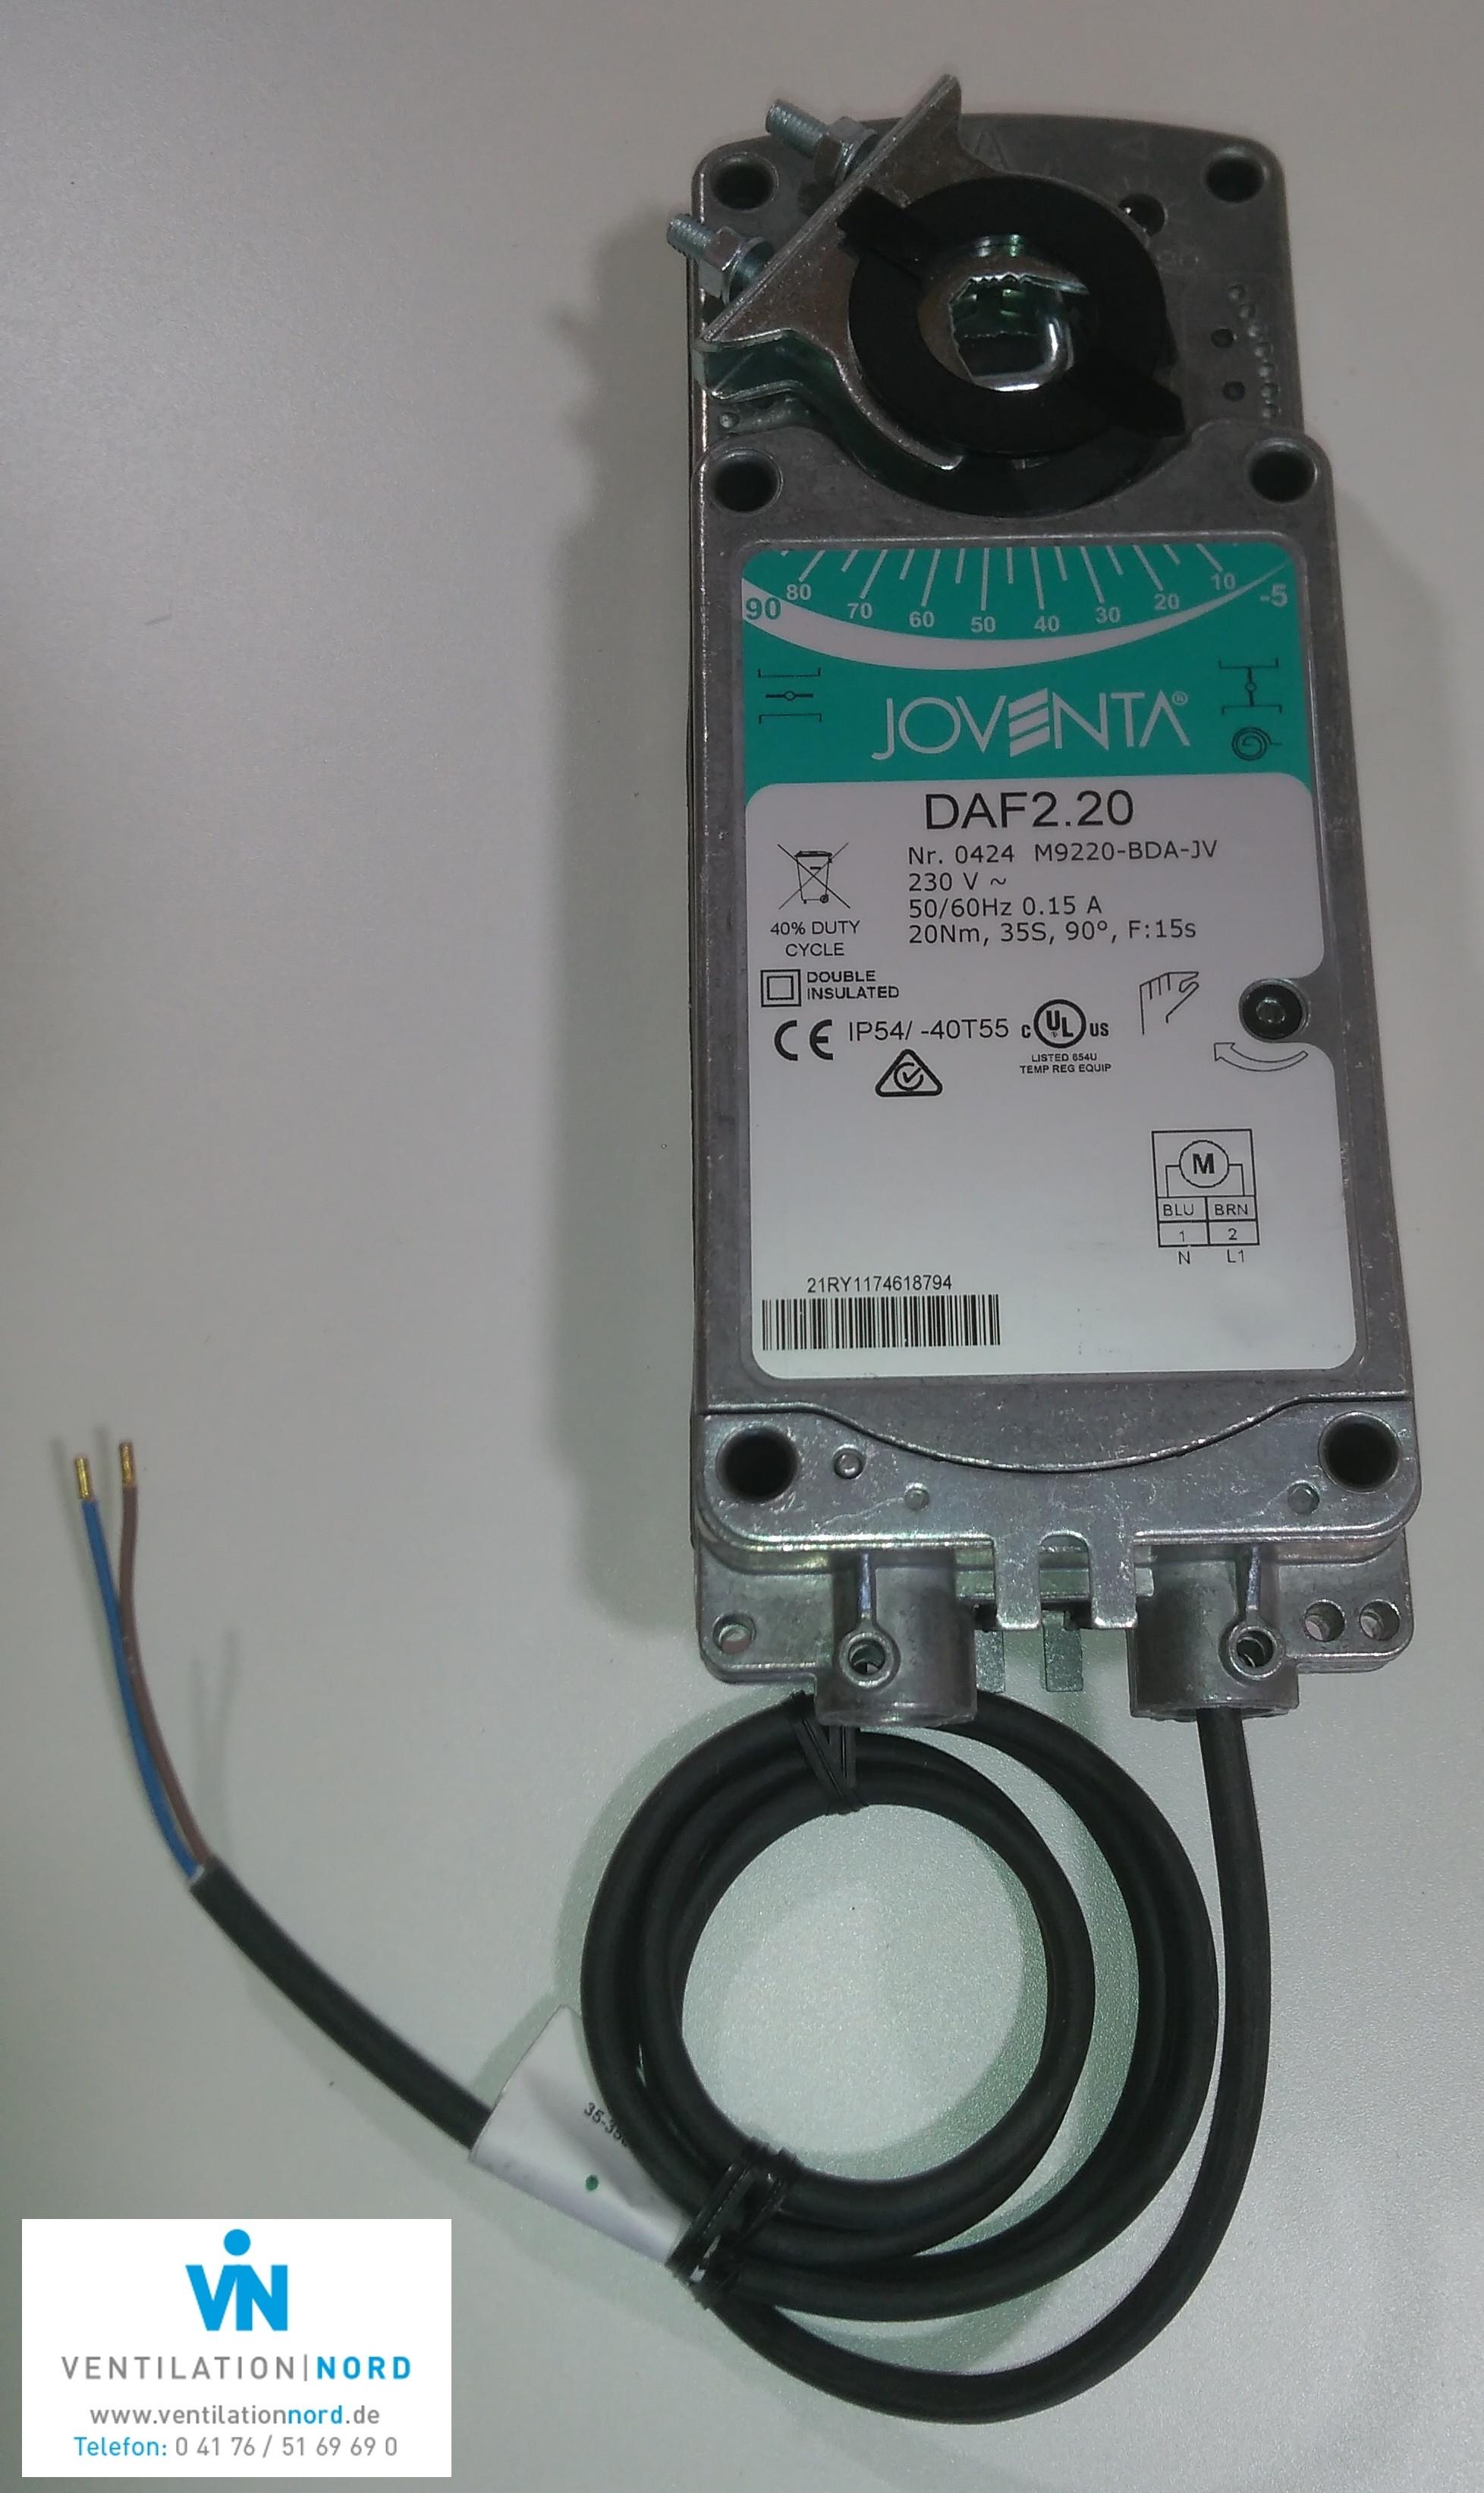 Joventa Klappenstellantrieb DAF1.20S Federrücklauf